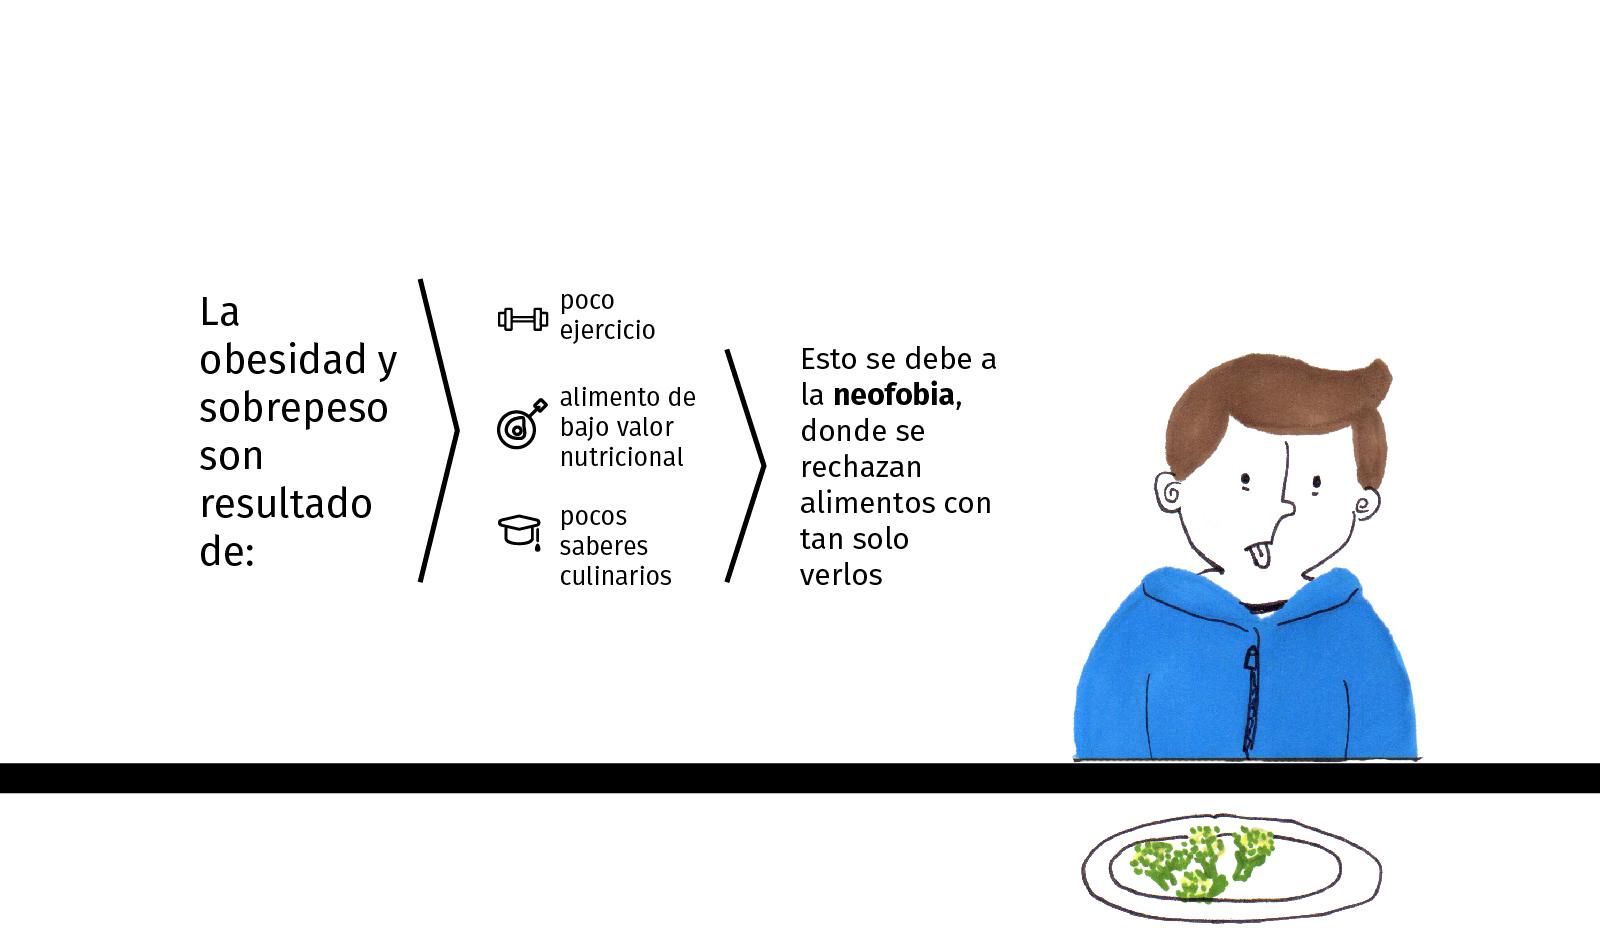 contenido_-_por_un_futuro_comestible_-_español-02